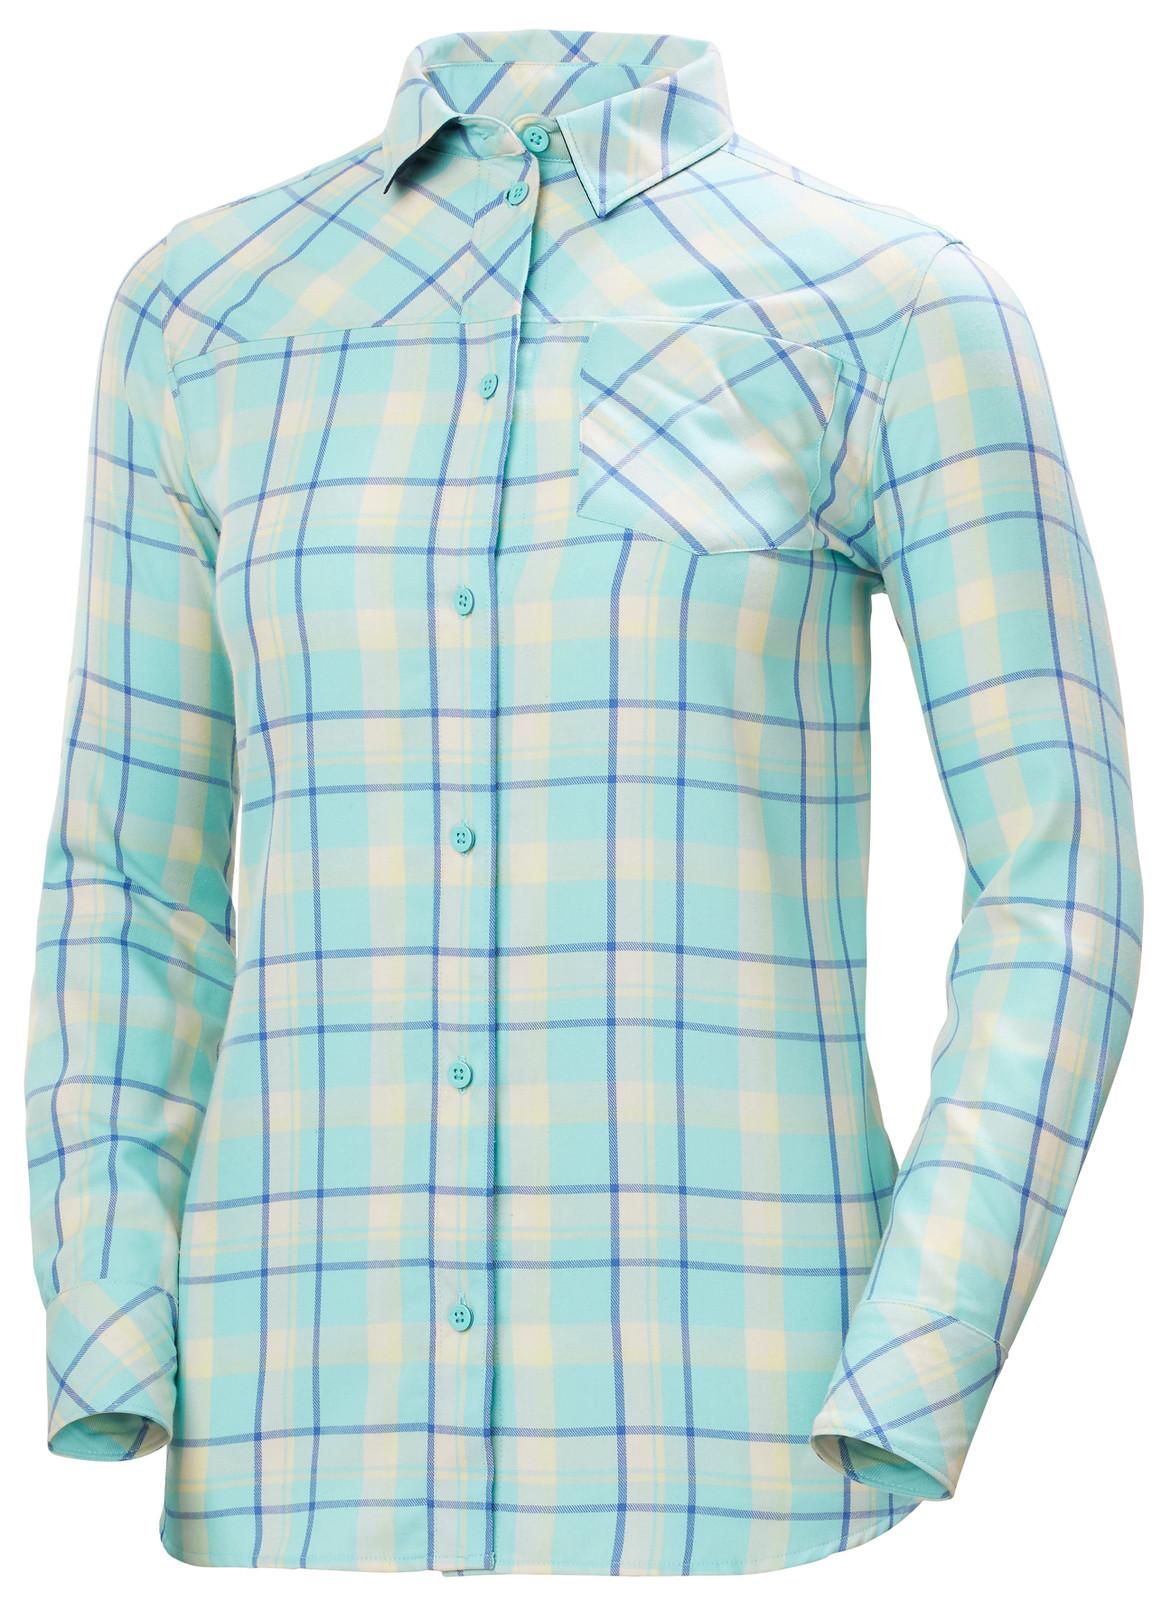 Helly Hansen Lokka LS Shirt, Women's - Glacier Blue, 62875-648